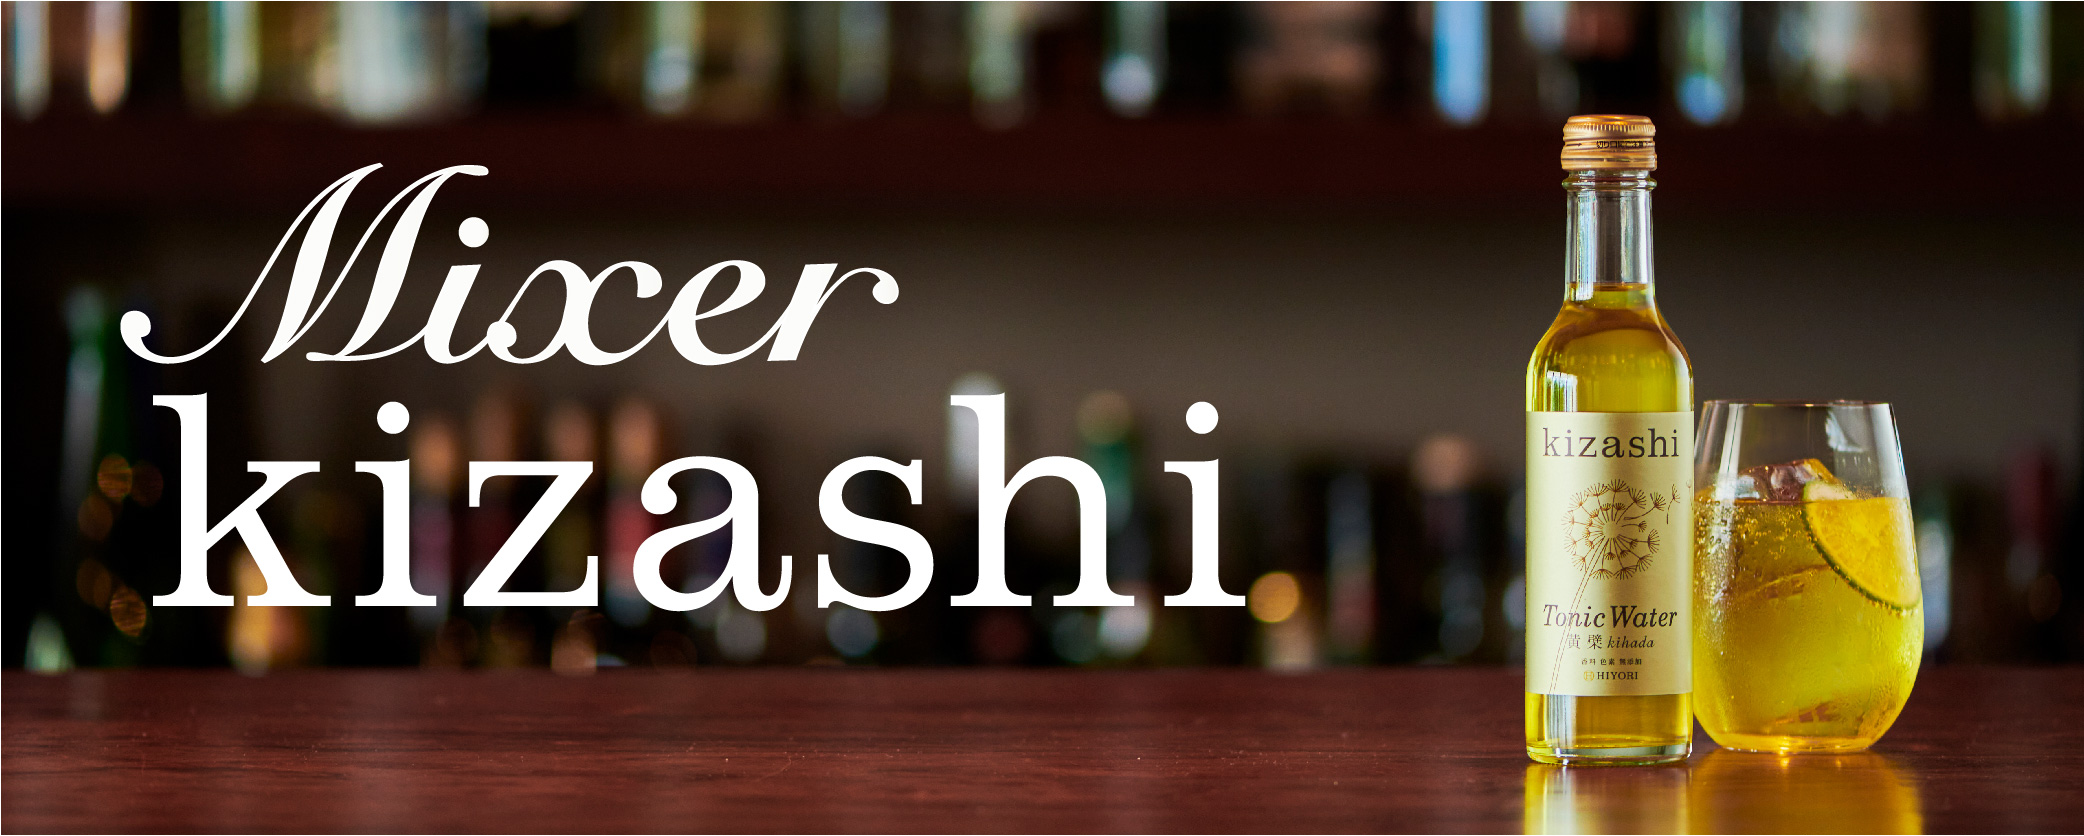 Mixer kizashi